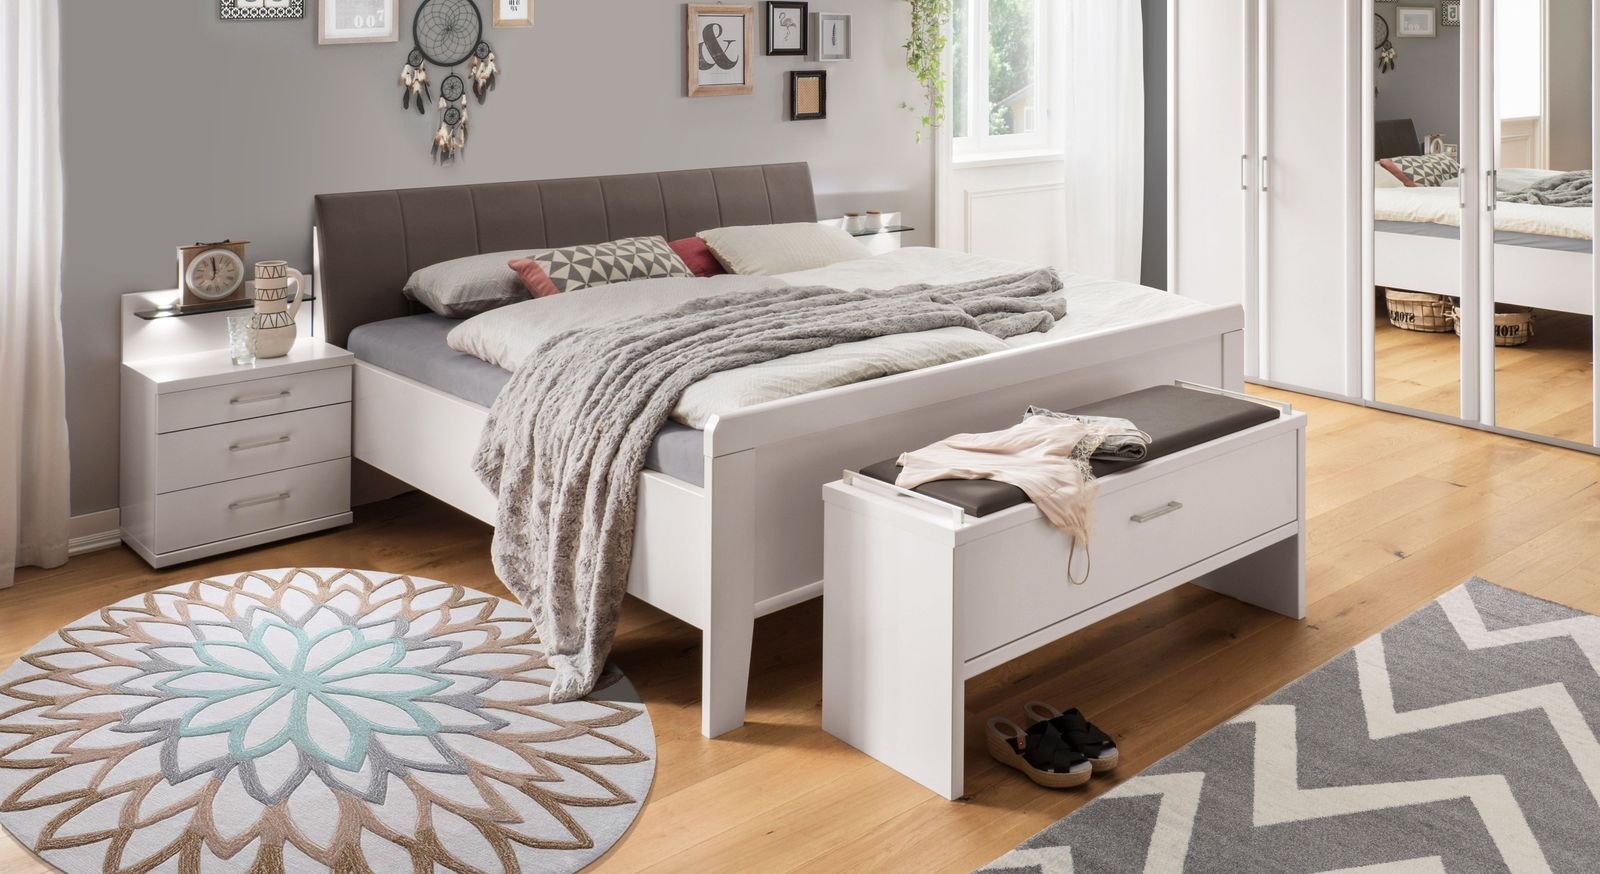 Komfort-Doppelbett Casperia inklusive Kopf- und Fußteil